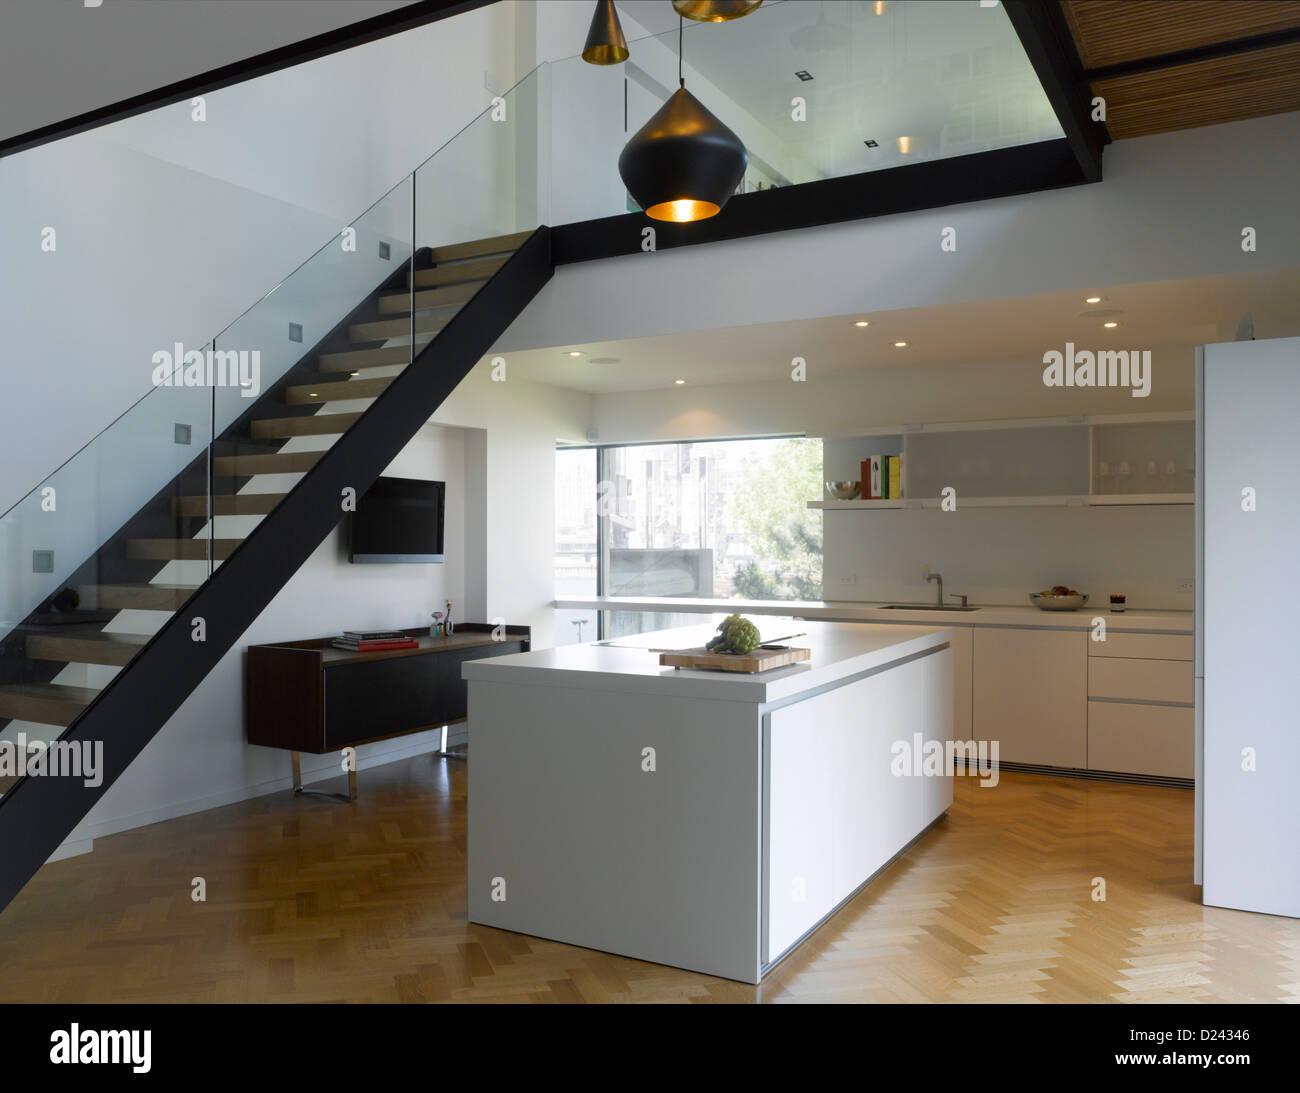 Kitchen Lighting Montreal: Habitat 67, Montreal, Canada. Architect: Moshie Safdie